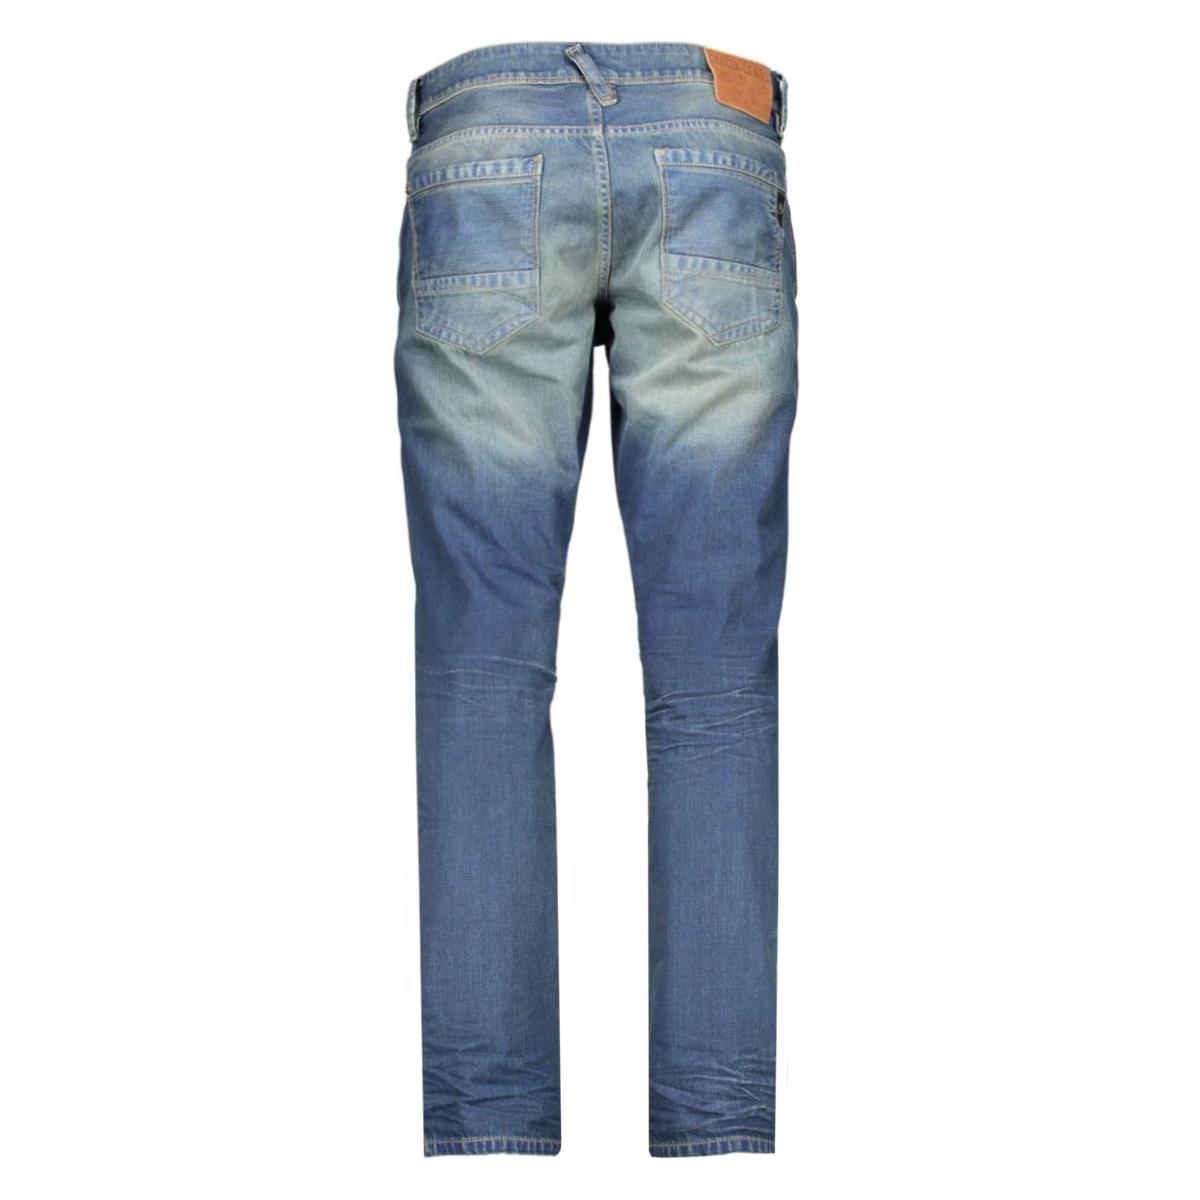 630/34 savio tapered garcia jeans 1329 med blue ovd